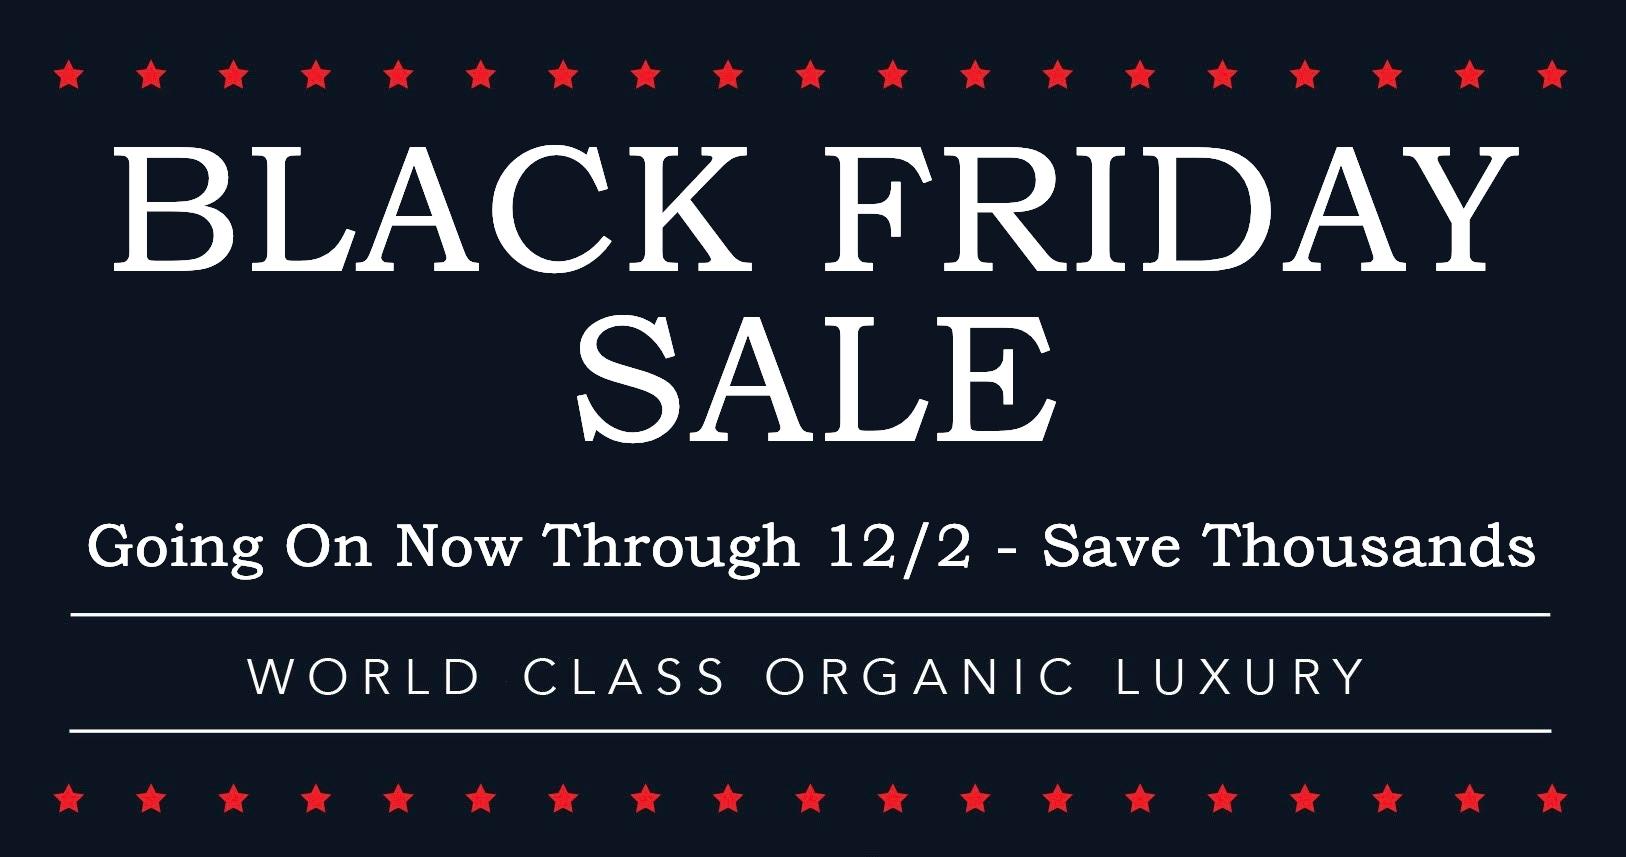 black friday sale 2020